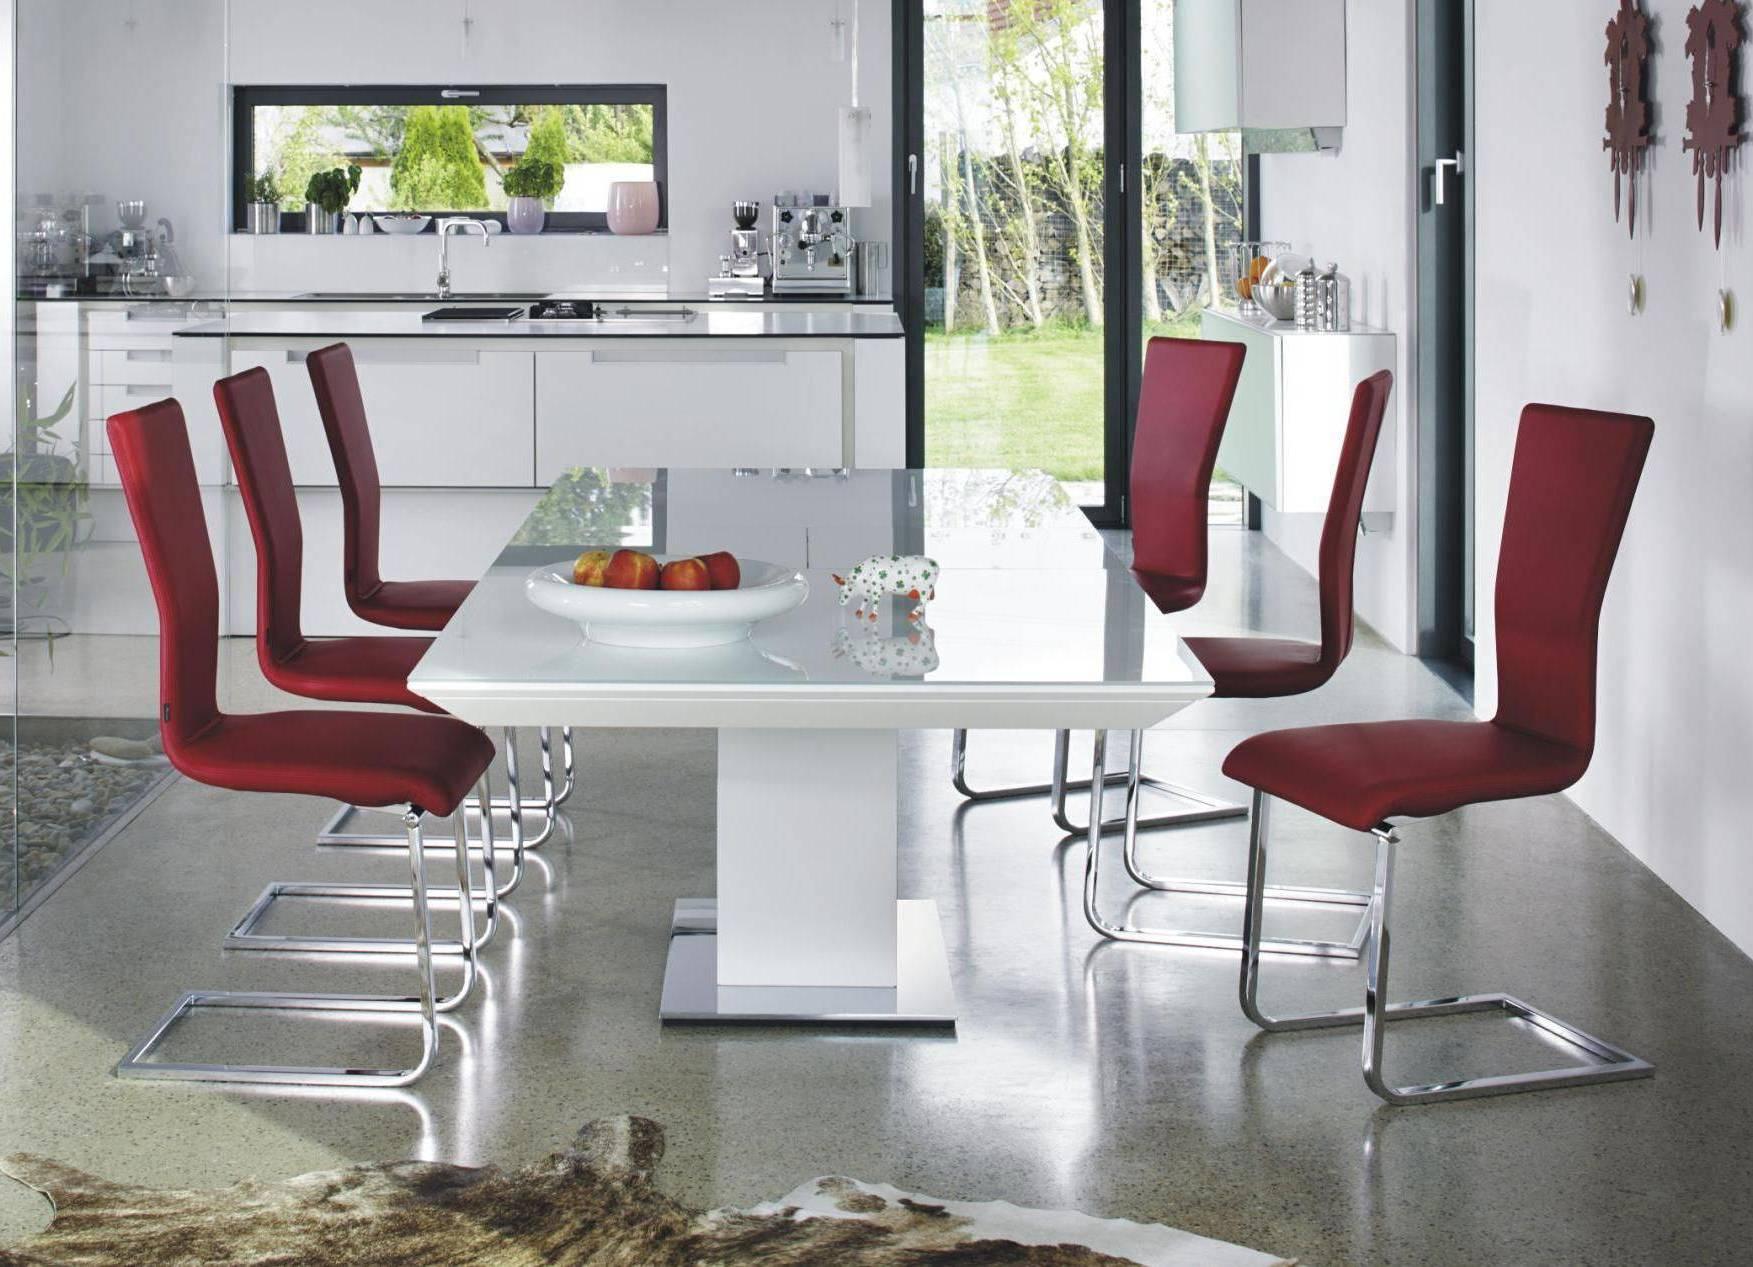 Раздвижной глянцевый стол